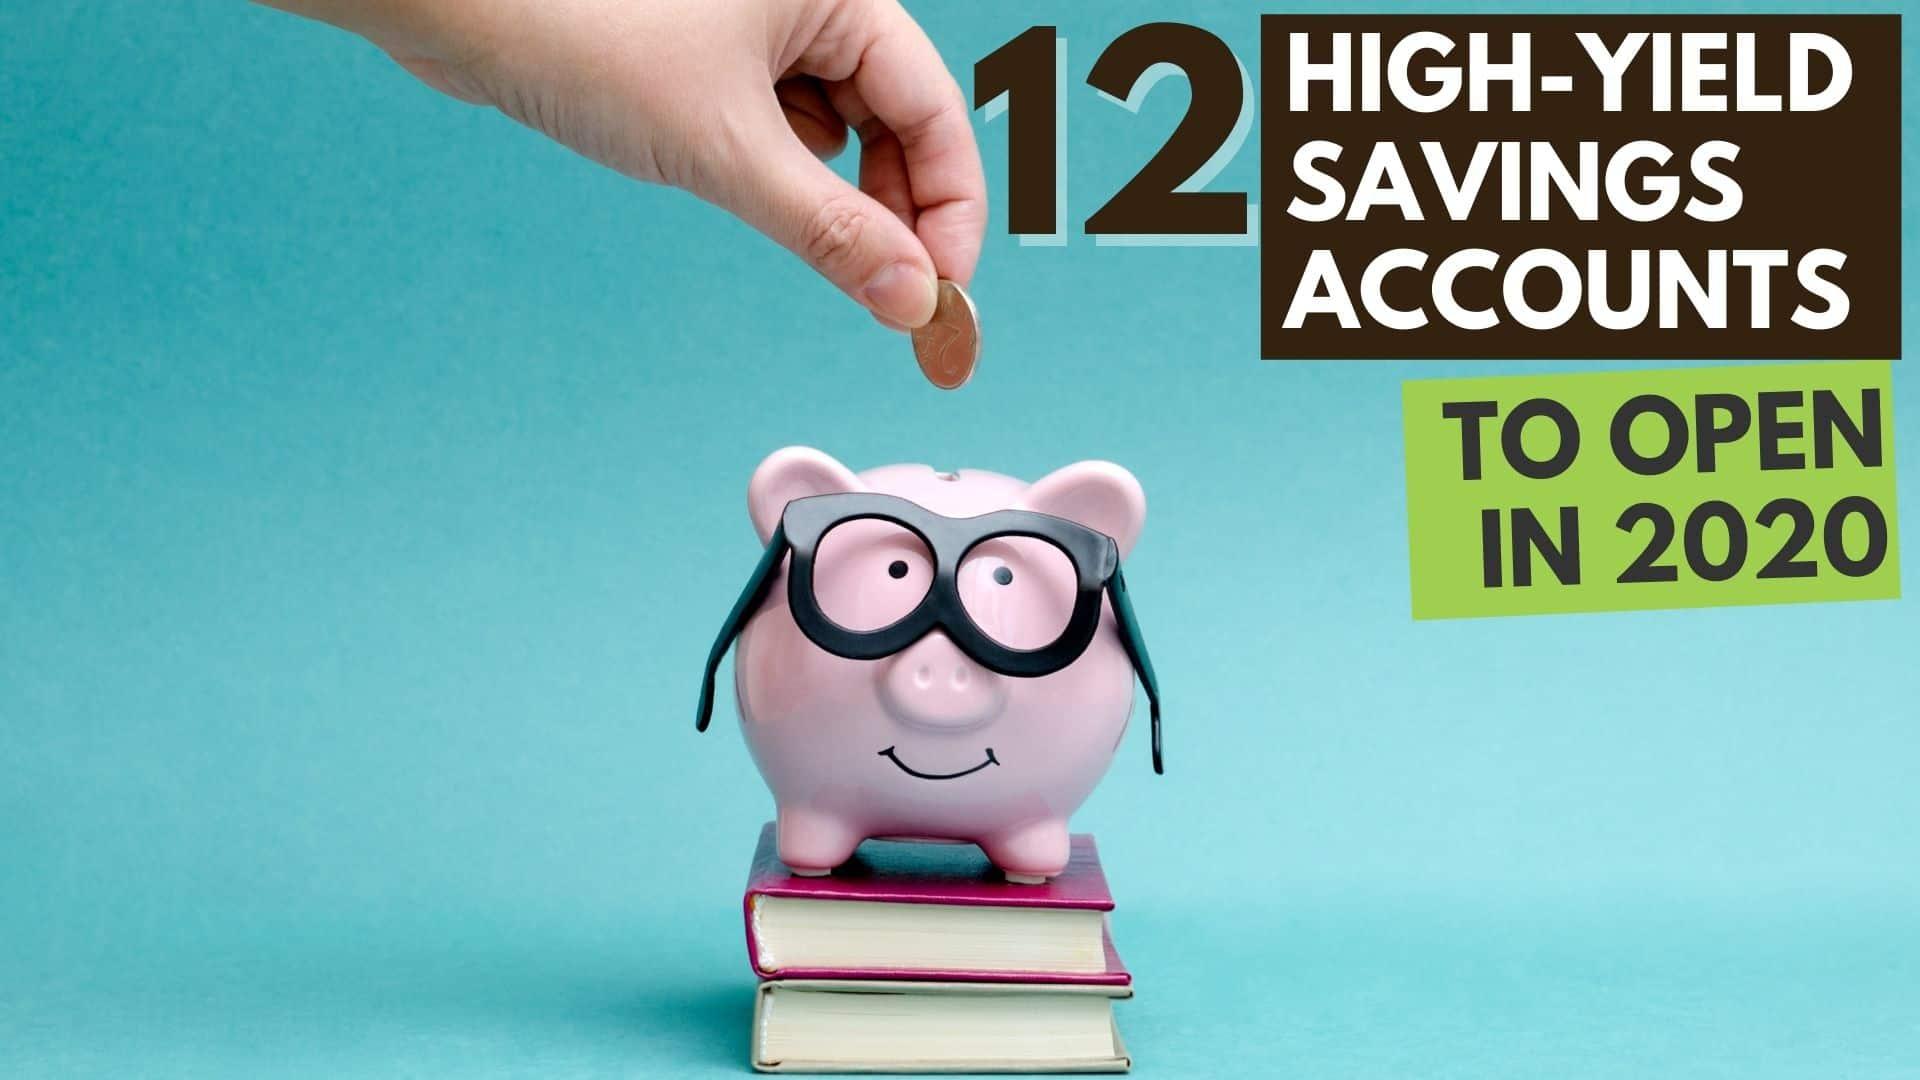 12 High-Yield Savings to open in 2020